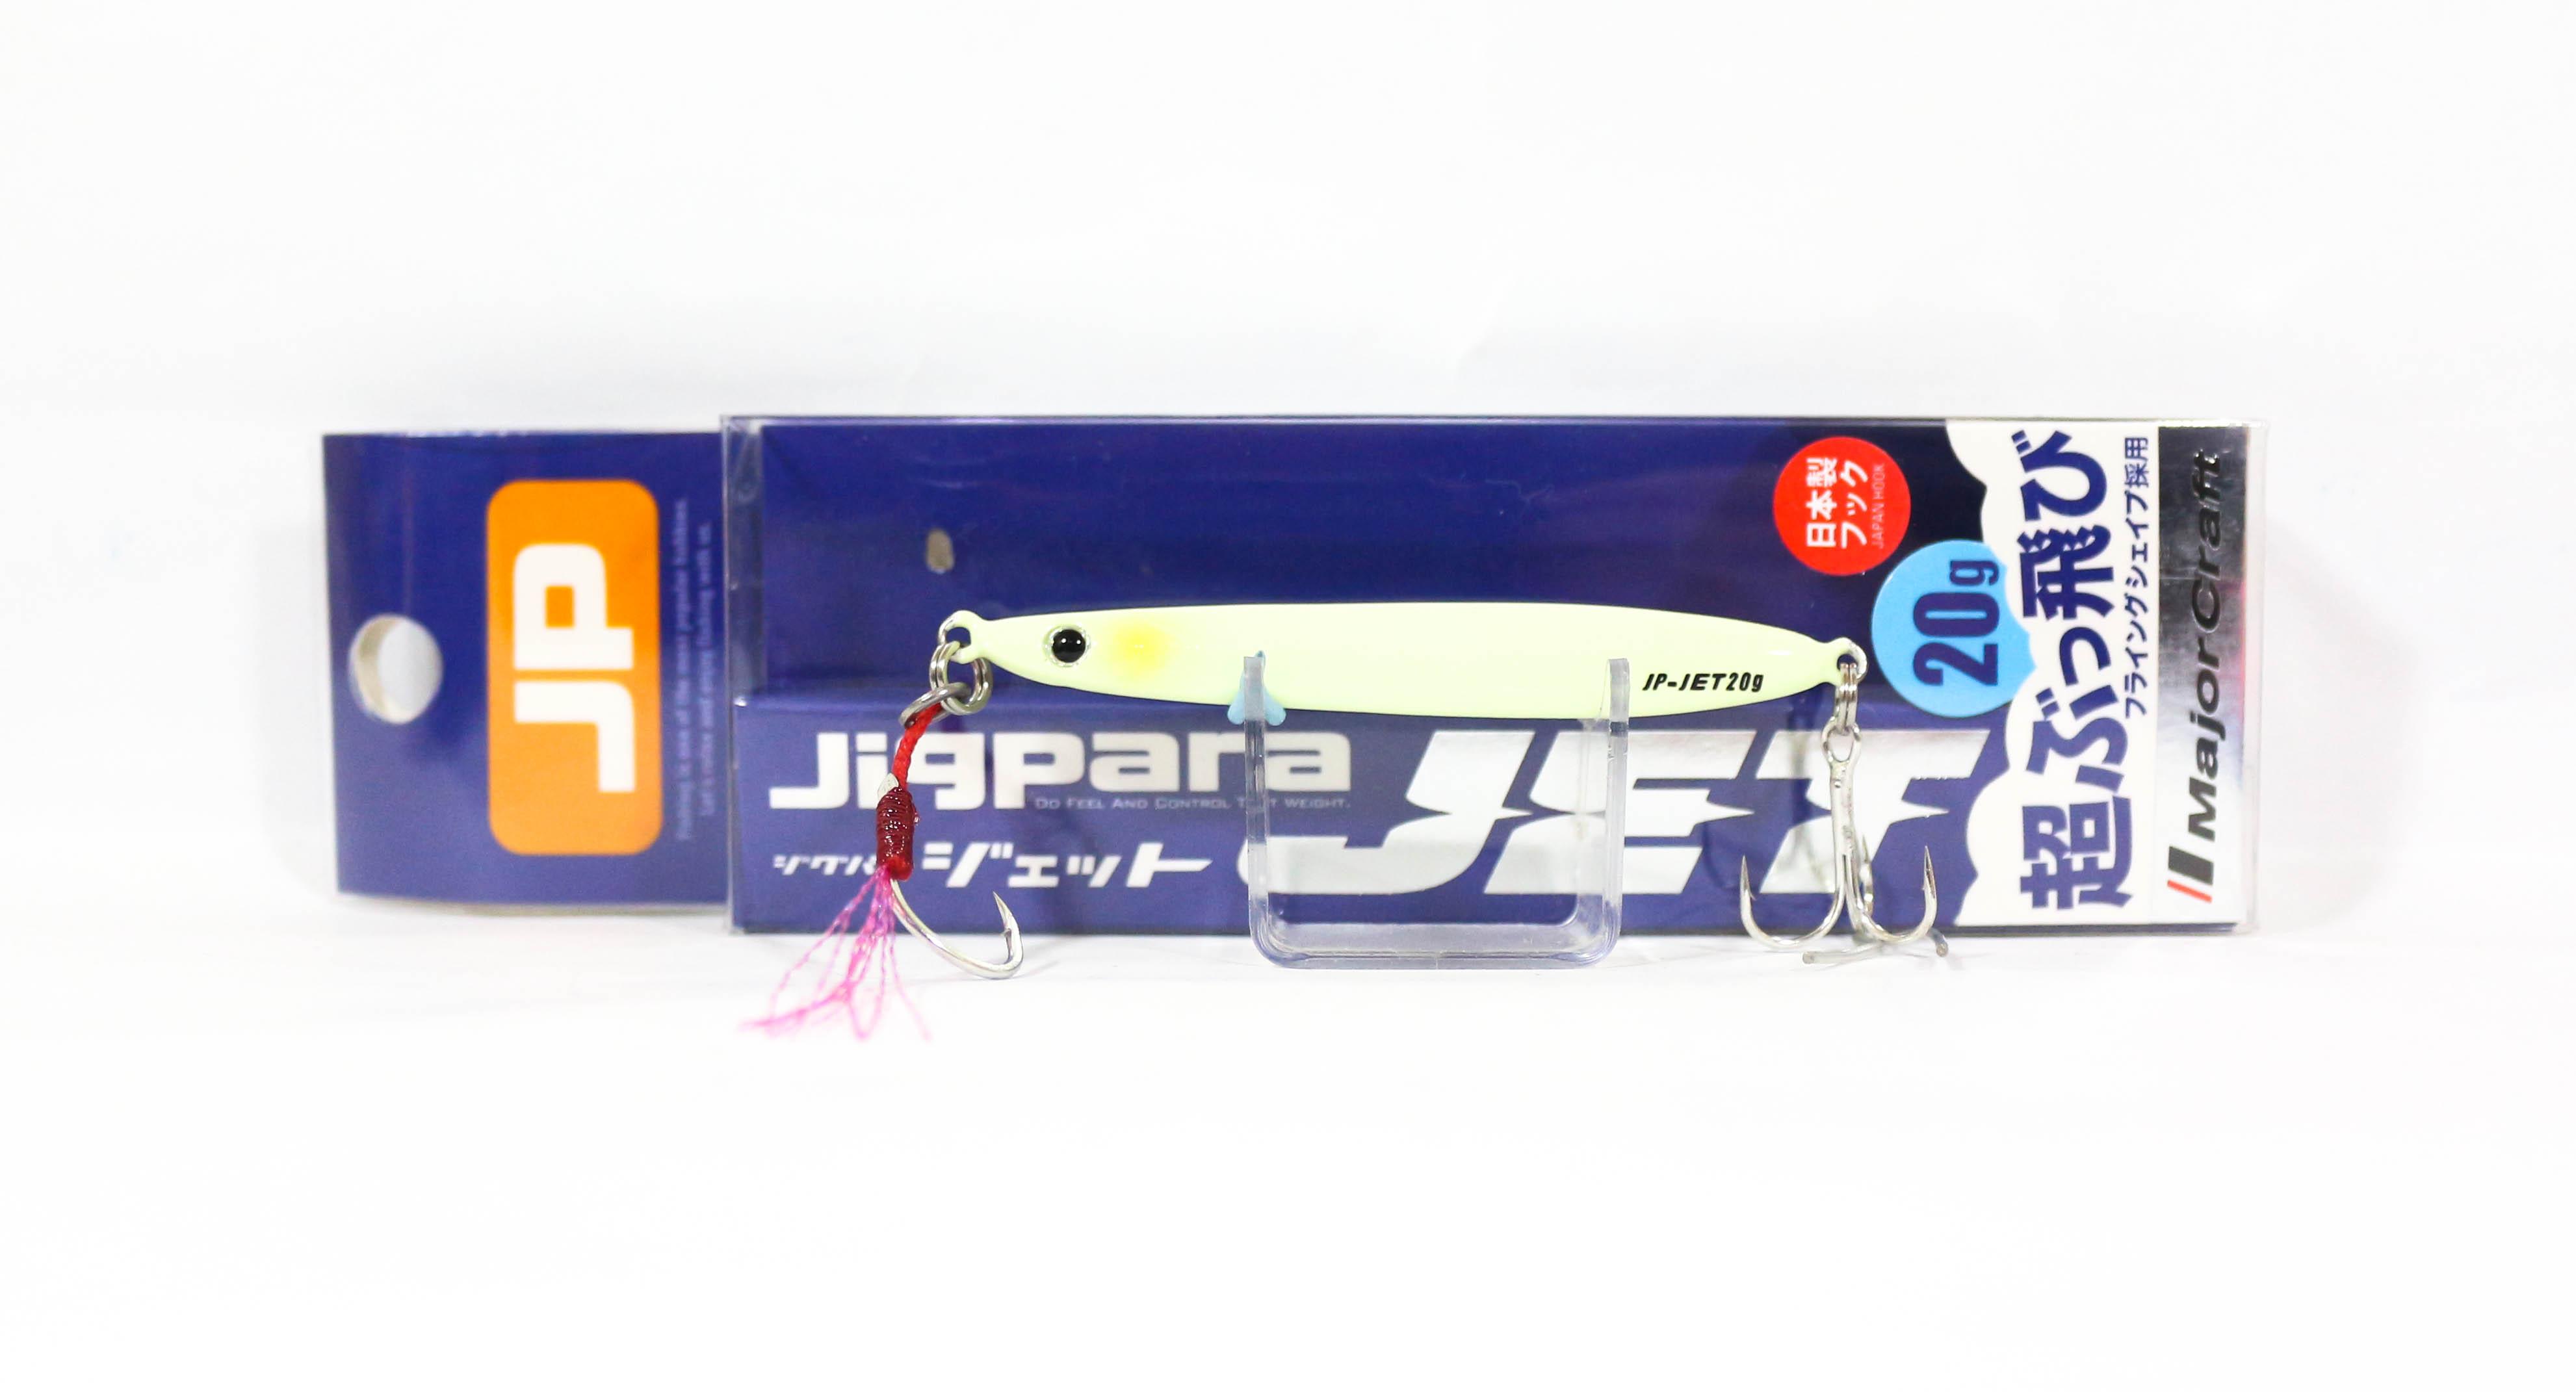 Major Craft Metal Jig Jigpara Jet JPS-JET 20 grams 019 (6363)